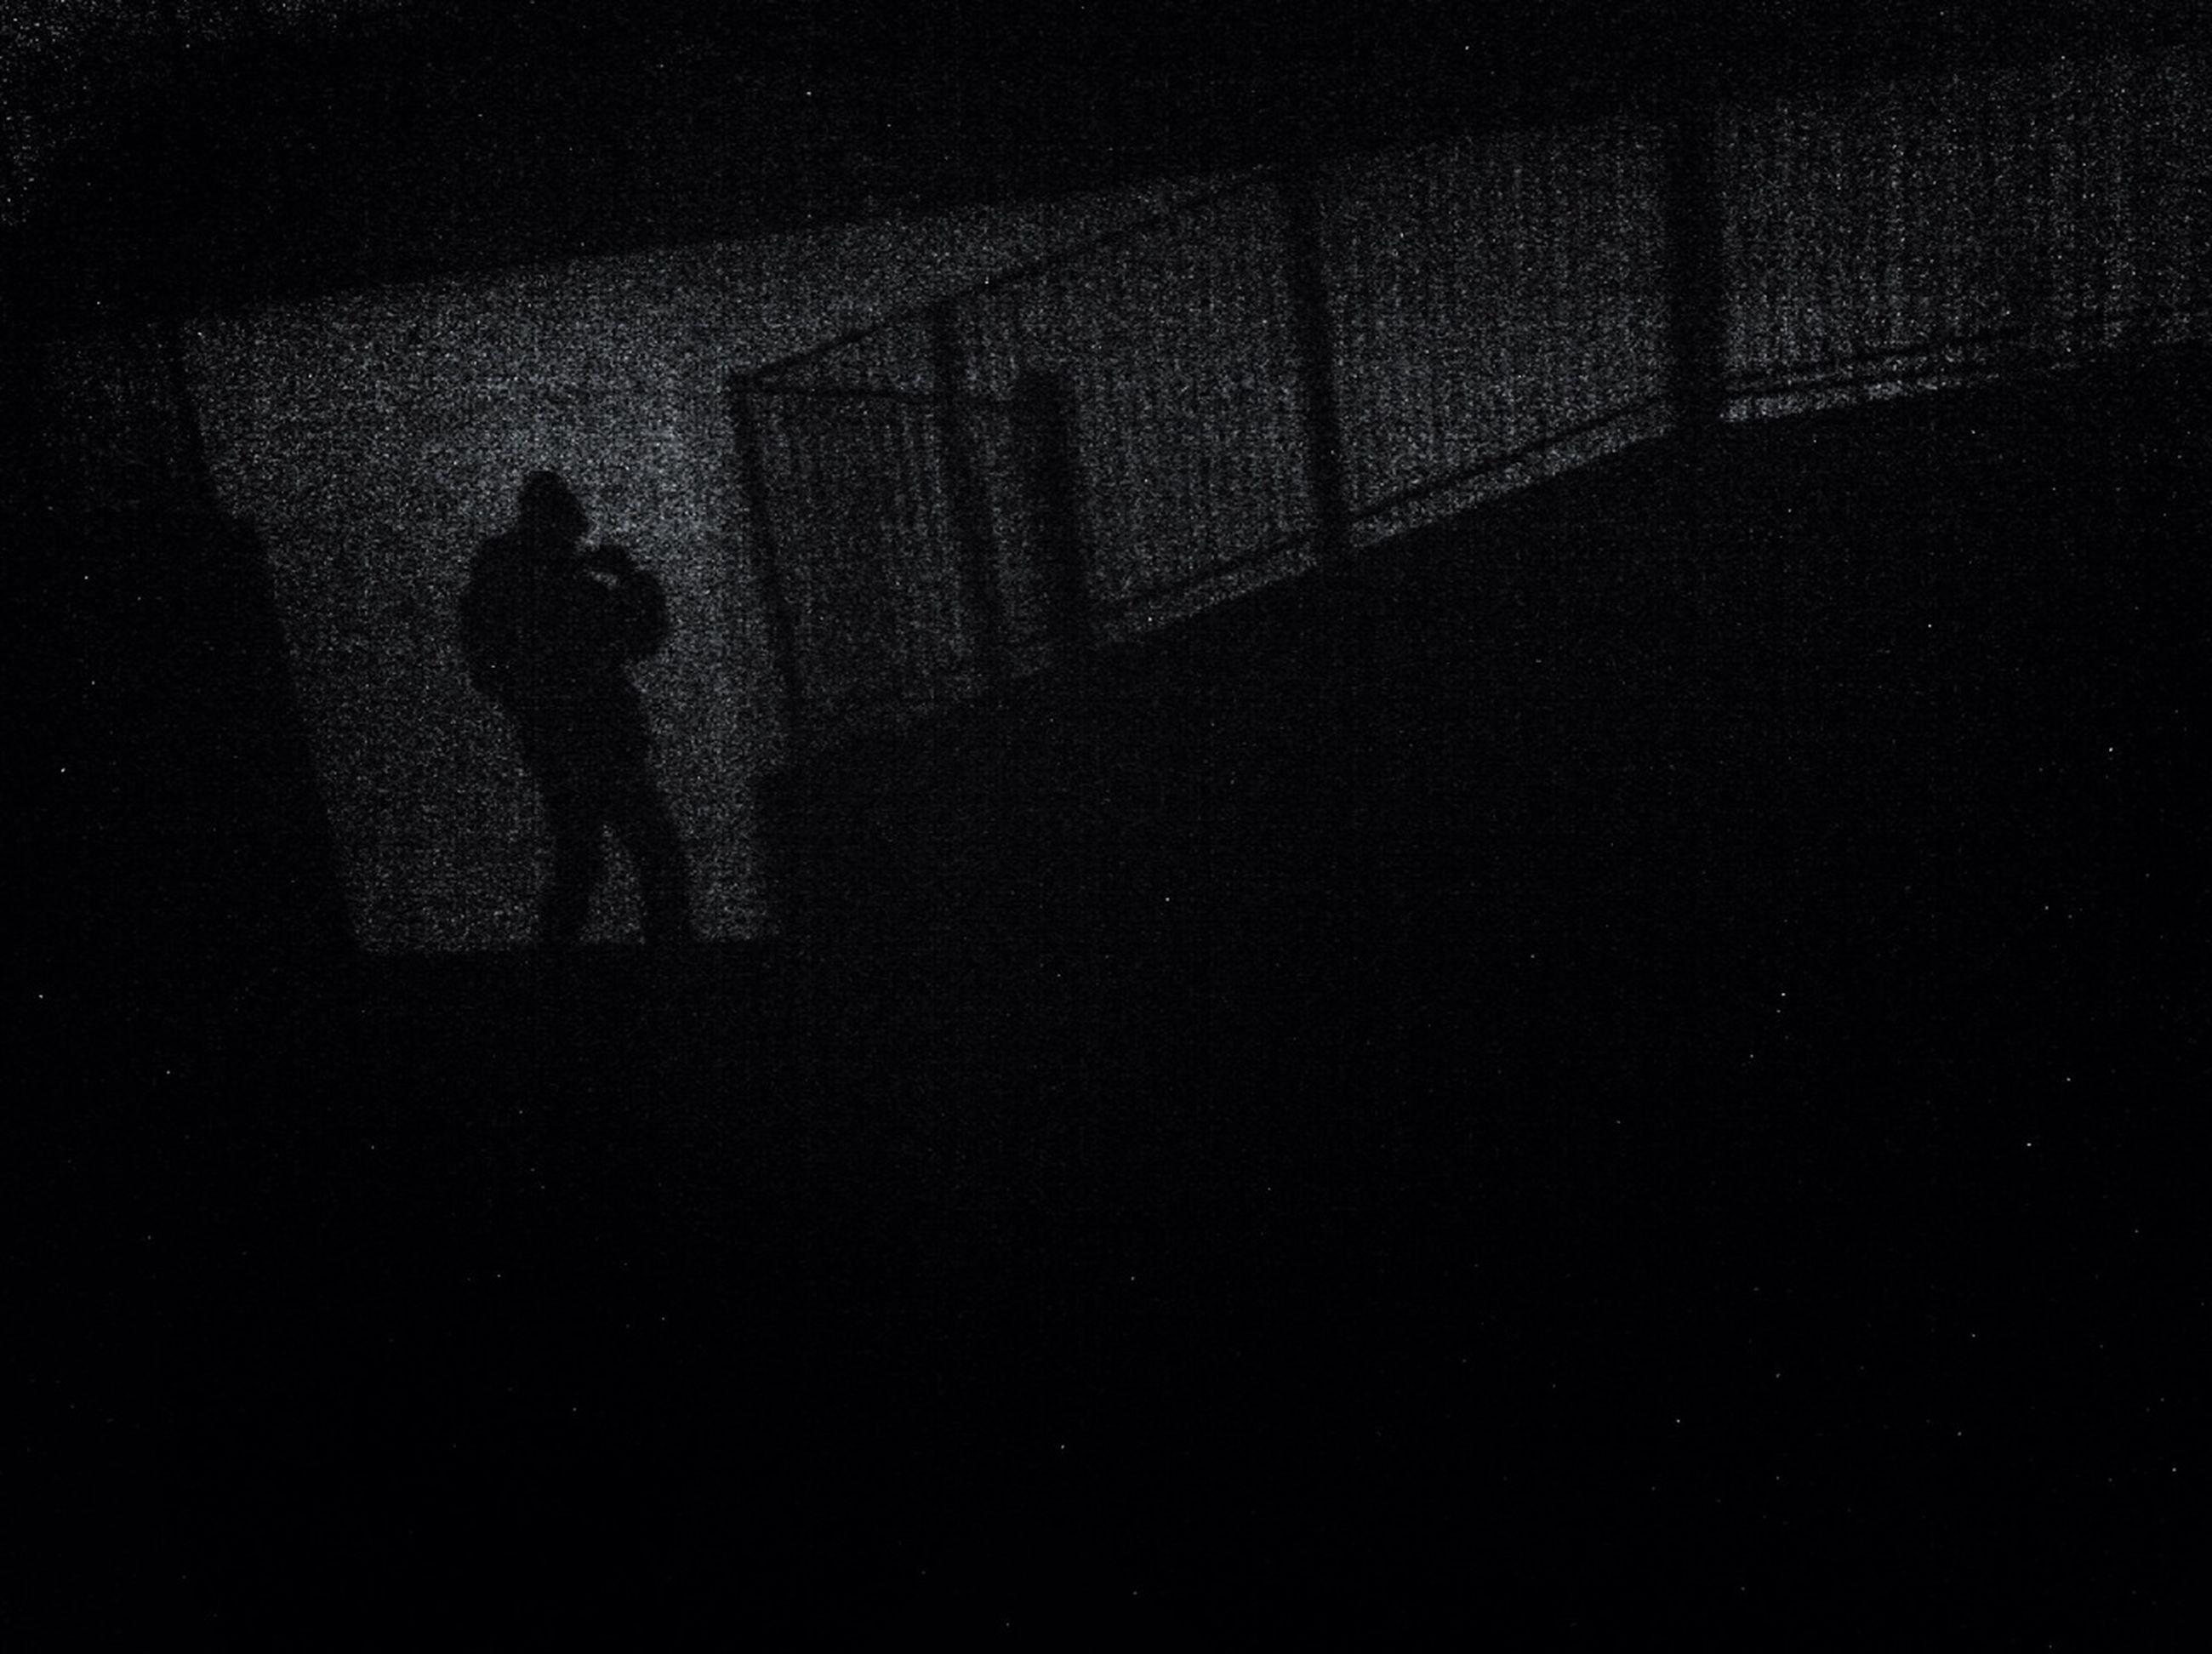 silhouette, dark, men, lifestyles, indoors, shadow, standing, unrecognizable person, leisure activity, night, outline, built structure, architecture, focus on shadow, wall - building feature, person, walking